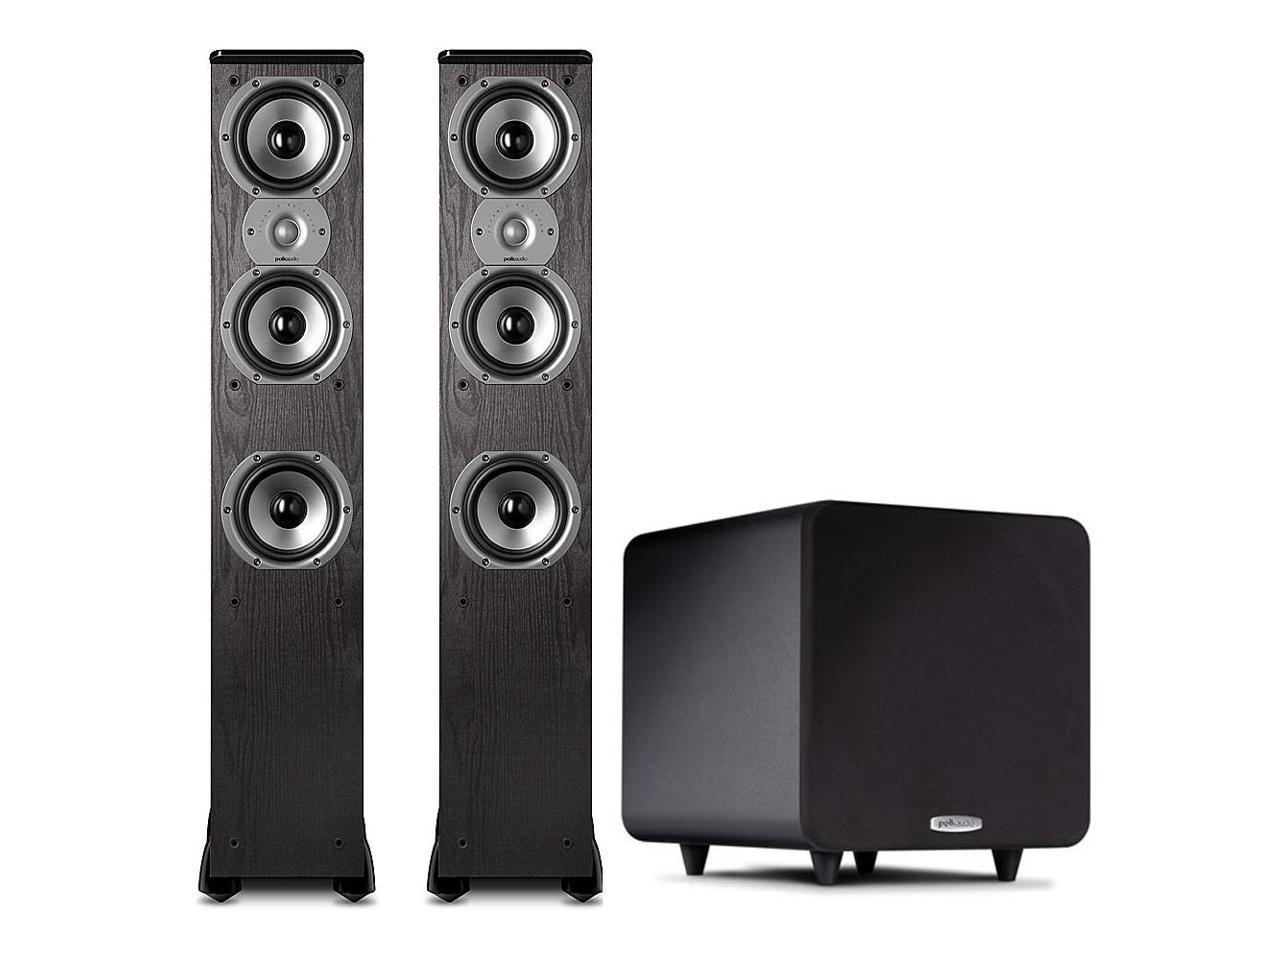 Polk Audio 2.1 Bundle w/ (2) TSi400 Floorstanding Speakers and PSW 111 Subwoofer